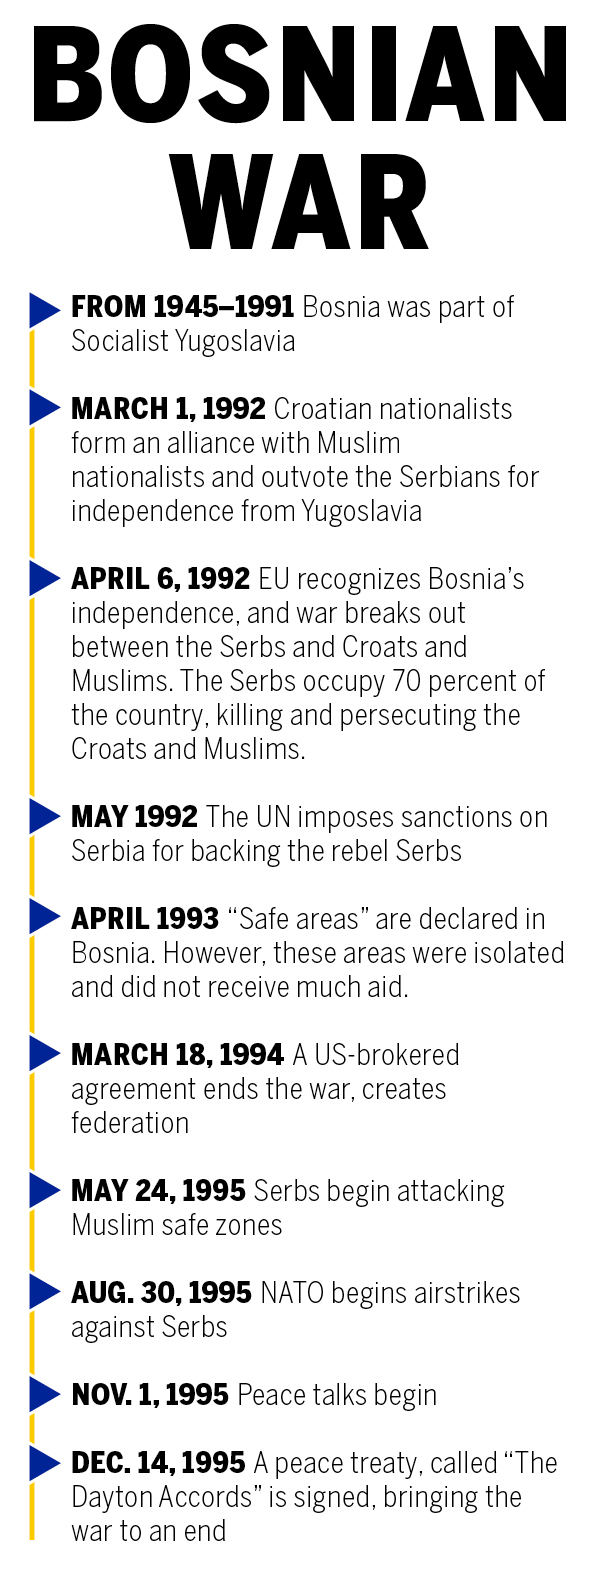 bosnian-war-timeline